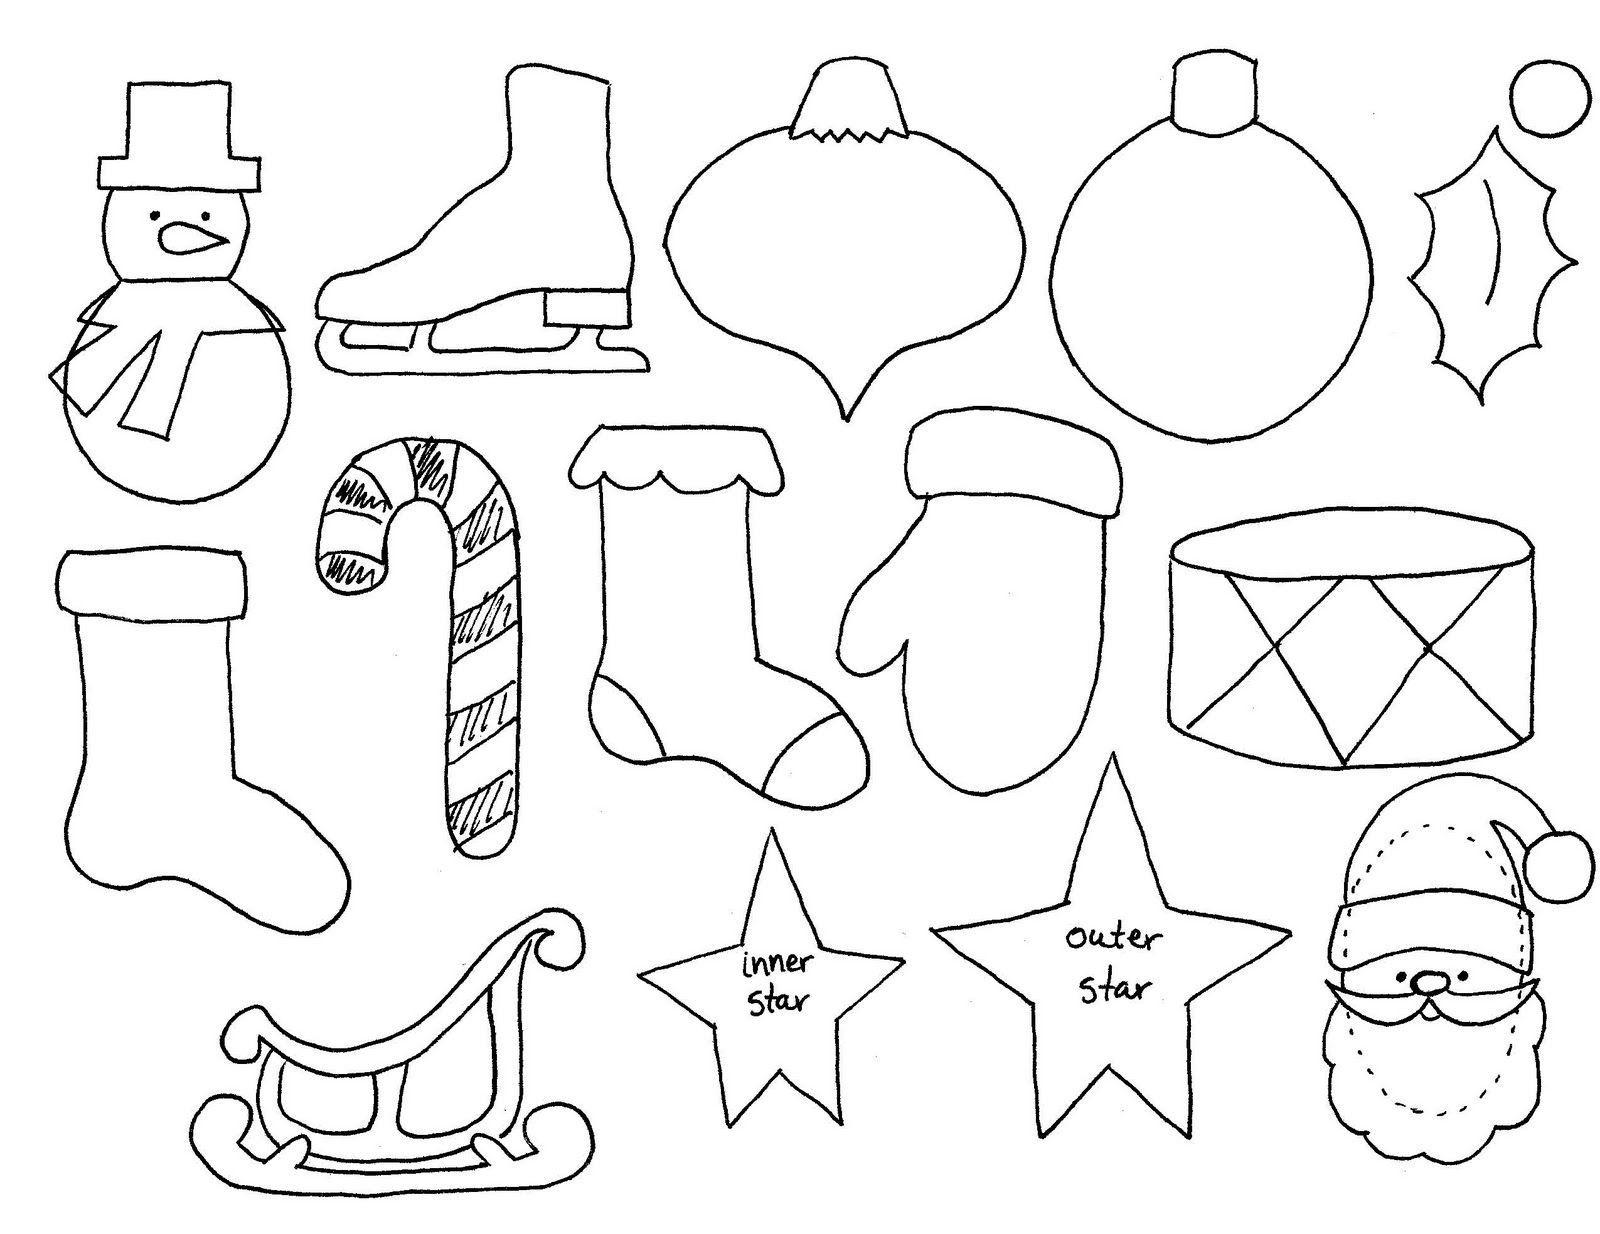 Free Printable Christmas Decoration Templates | Natal | Christmas - Free Printable Christmas Ornament Patterns